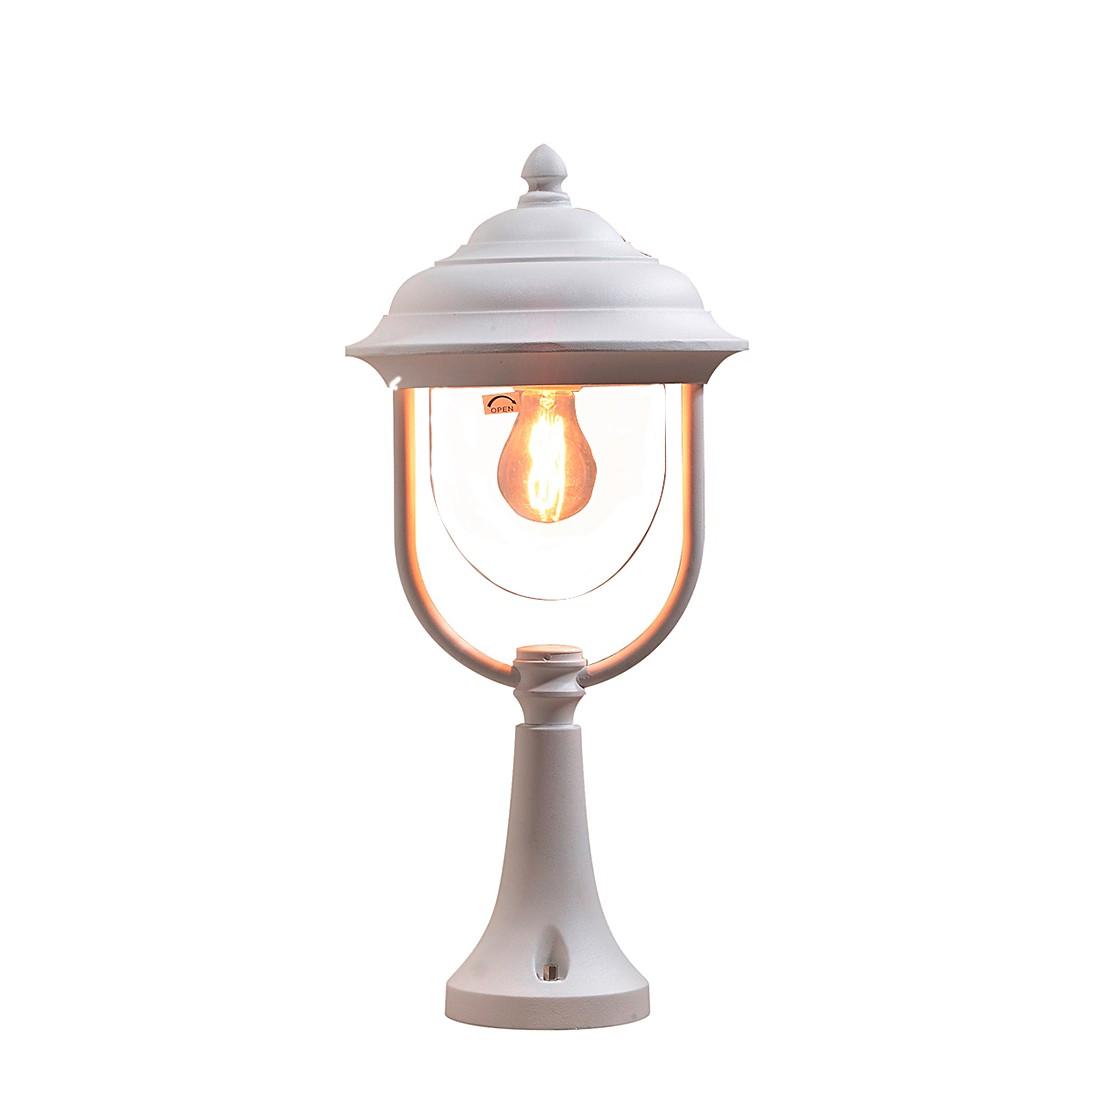 Sockelleuchte Parma ● Aluminium/Glas ● 1-flammig- Konstsmide A++